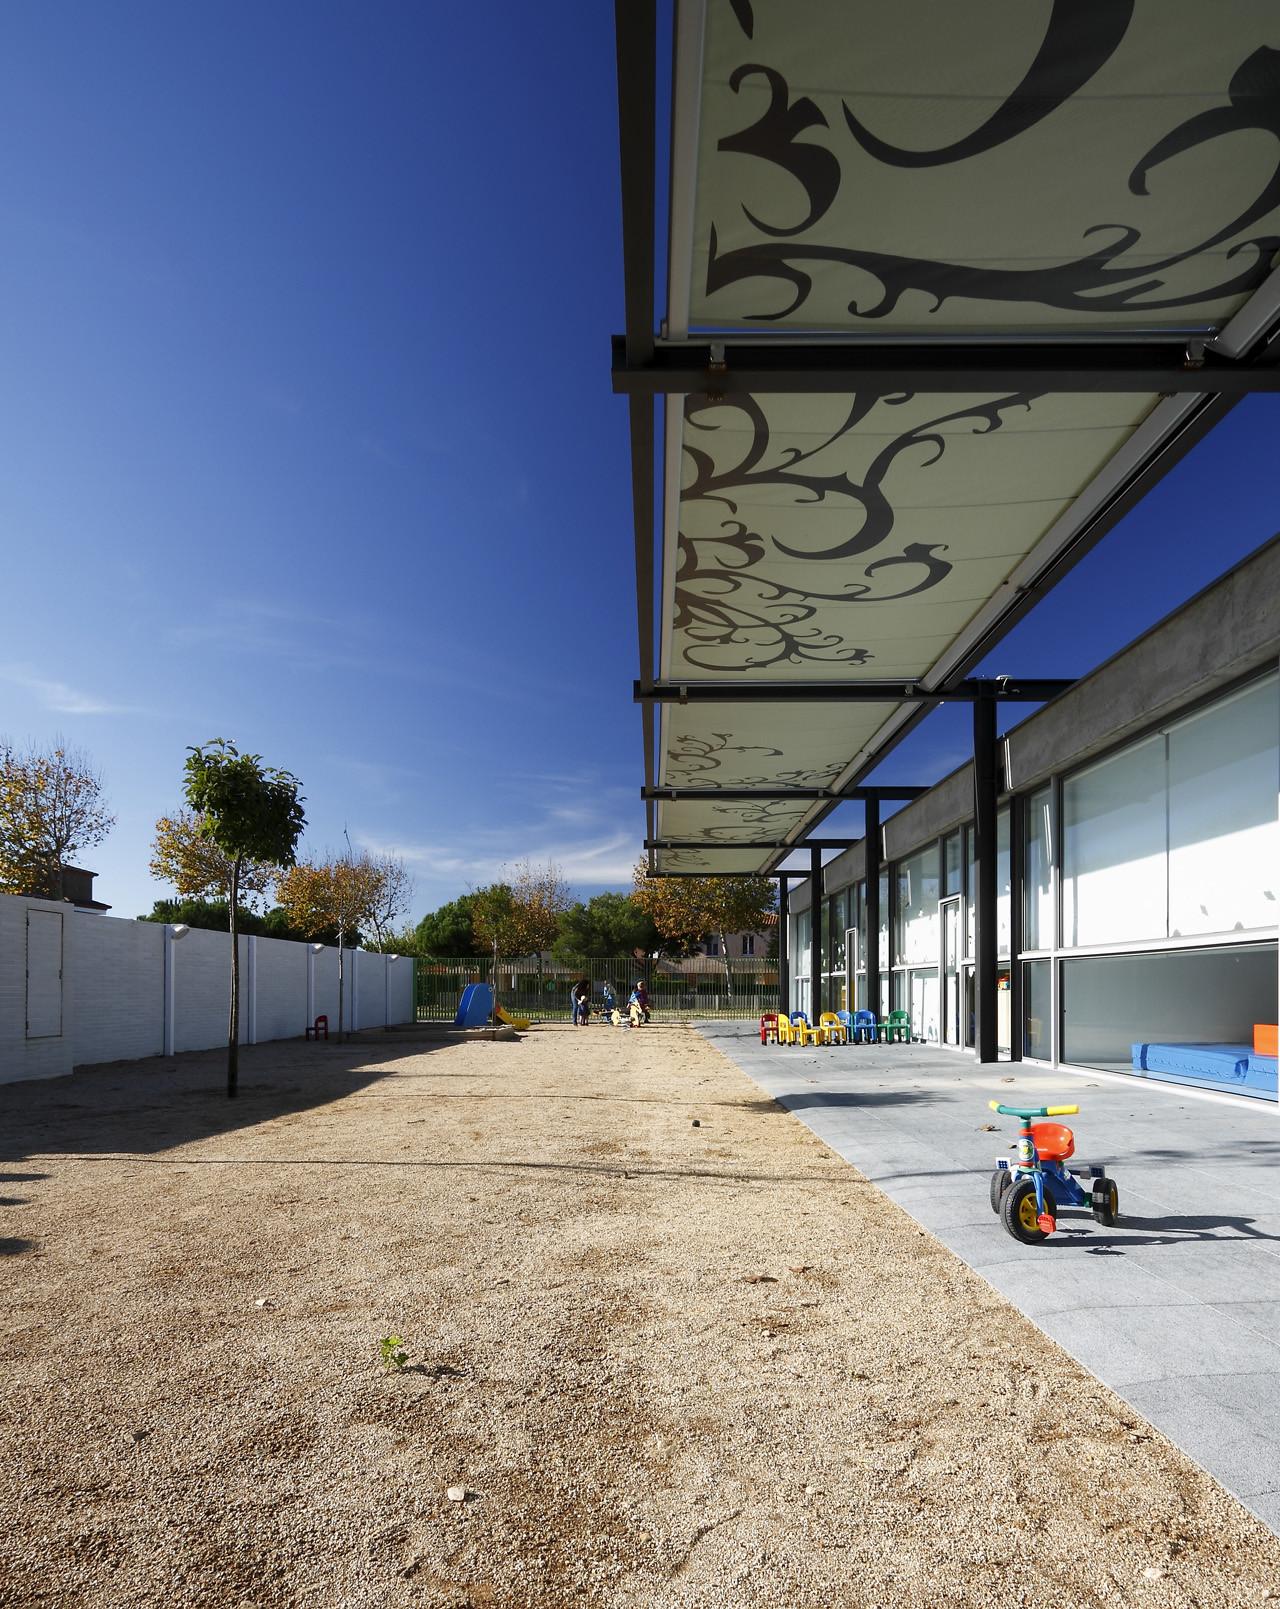 Galer a de jard n de infancia abar arquitectos ovidi for Cd market galeria jardin